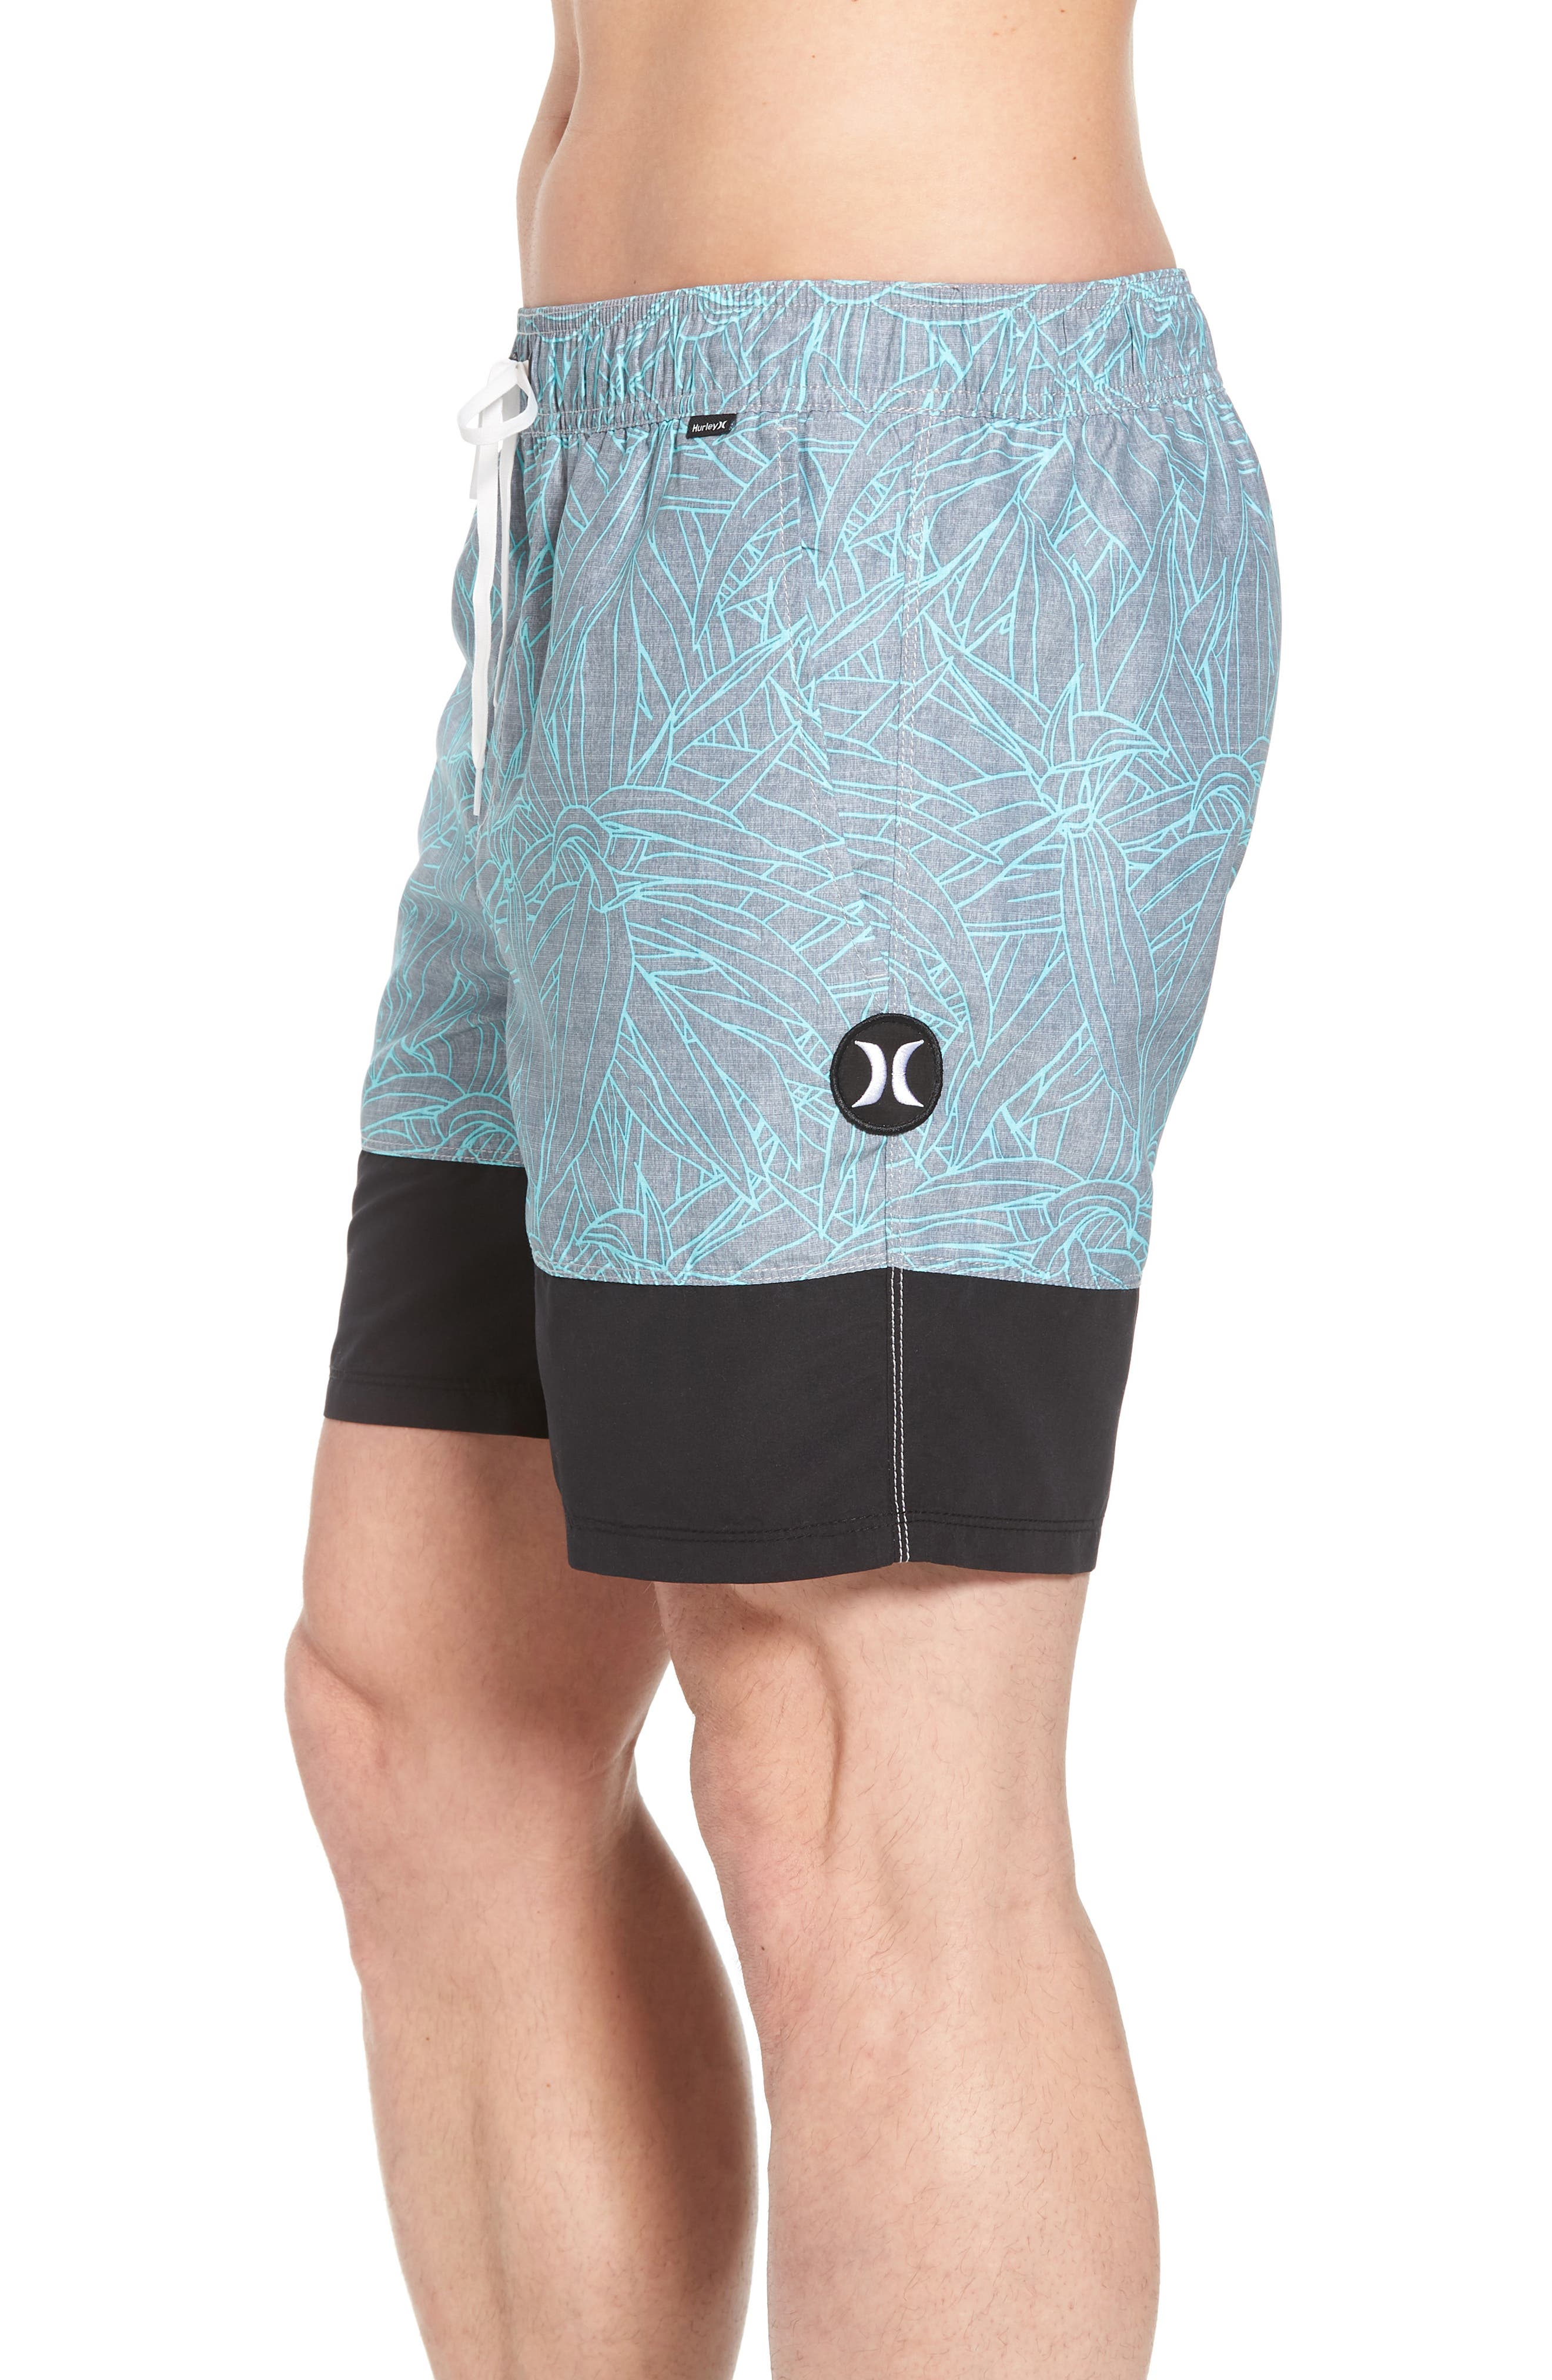 Pupkea Volley Board Shorts,                             Alternate thumbnail 3, color,                             065